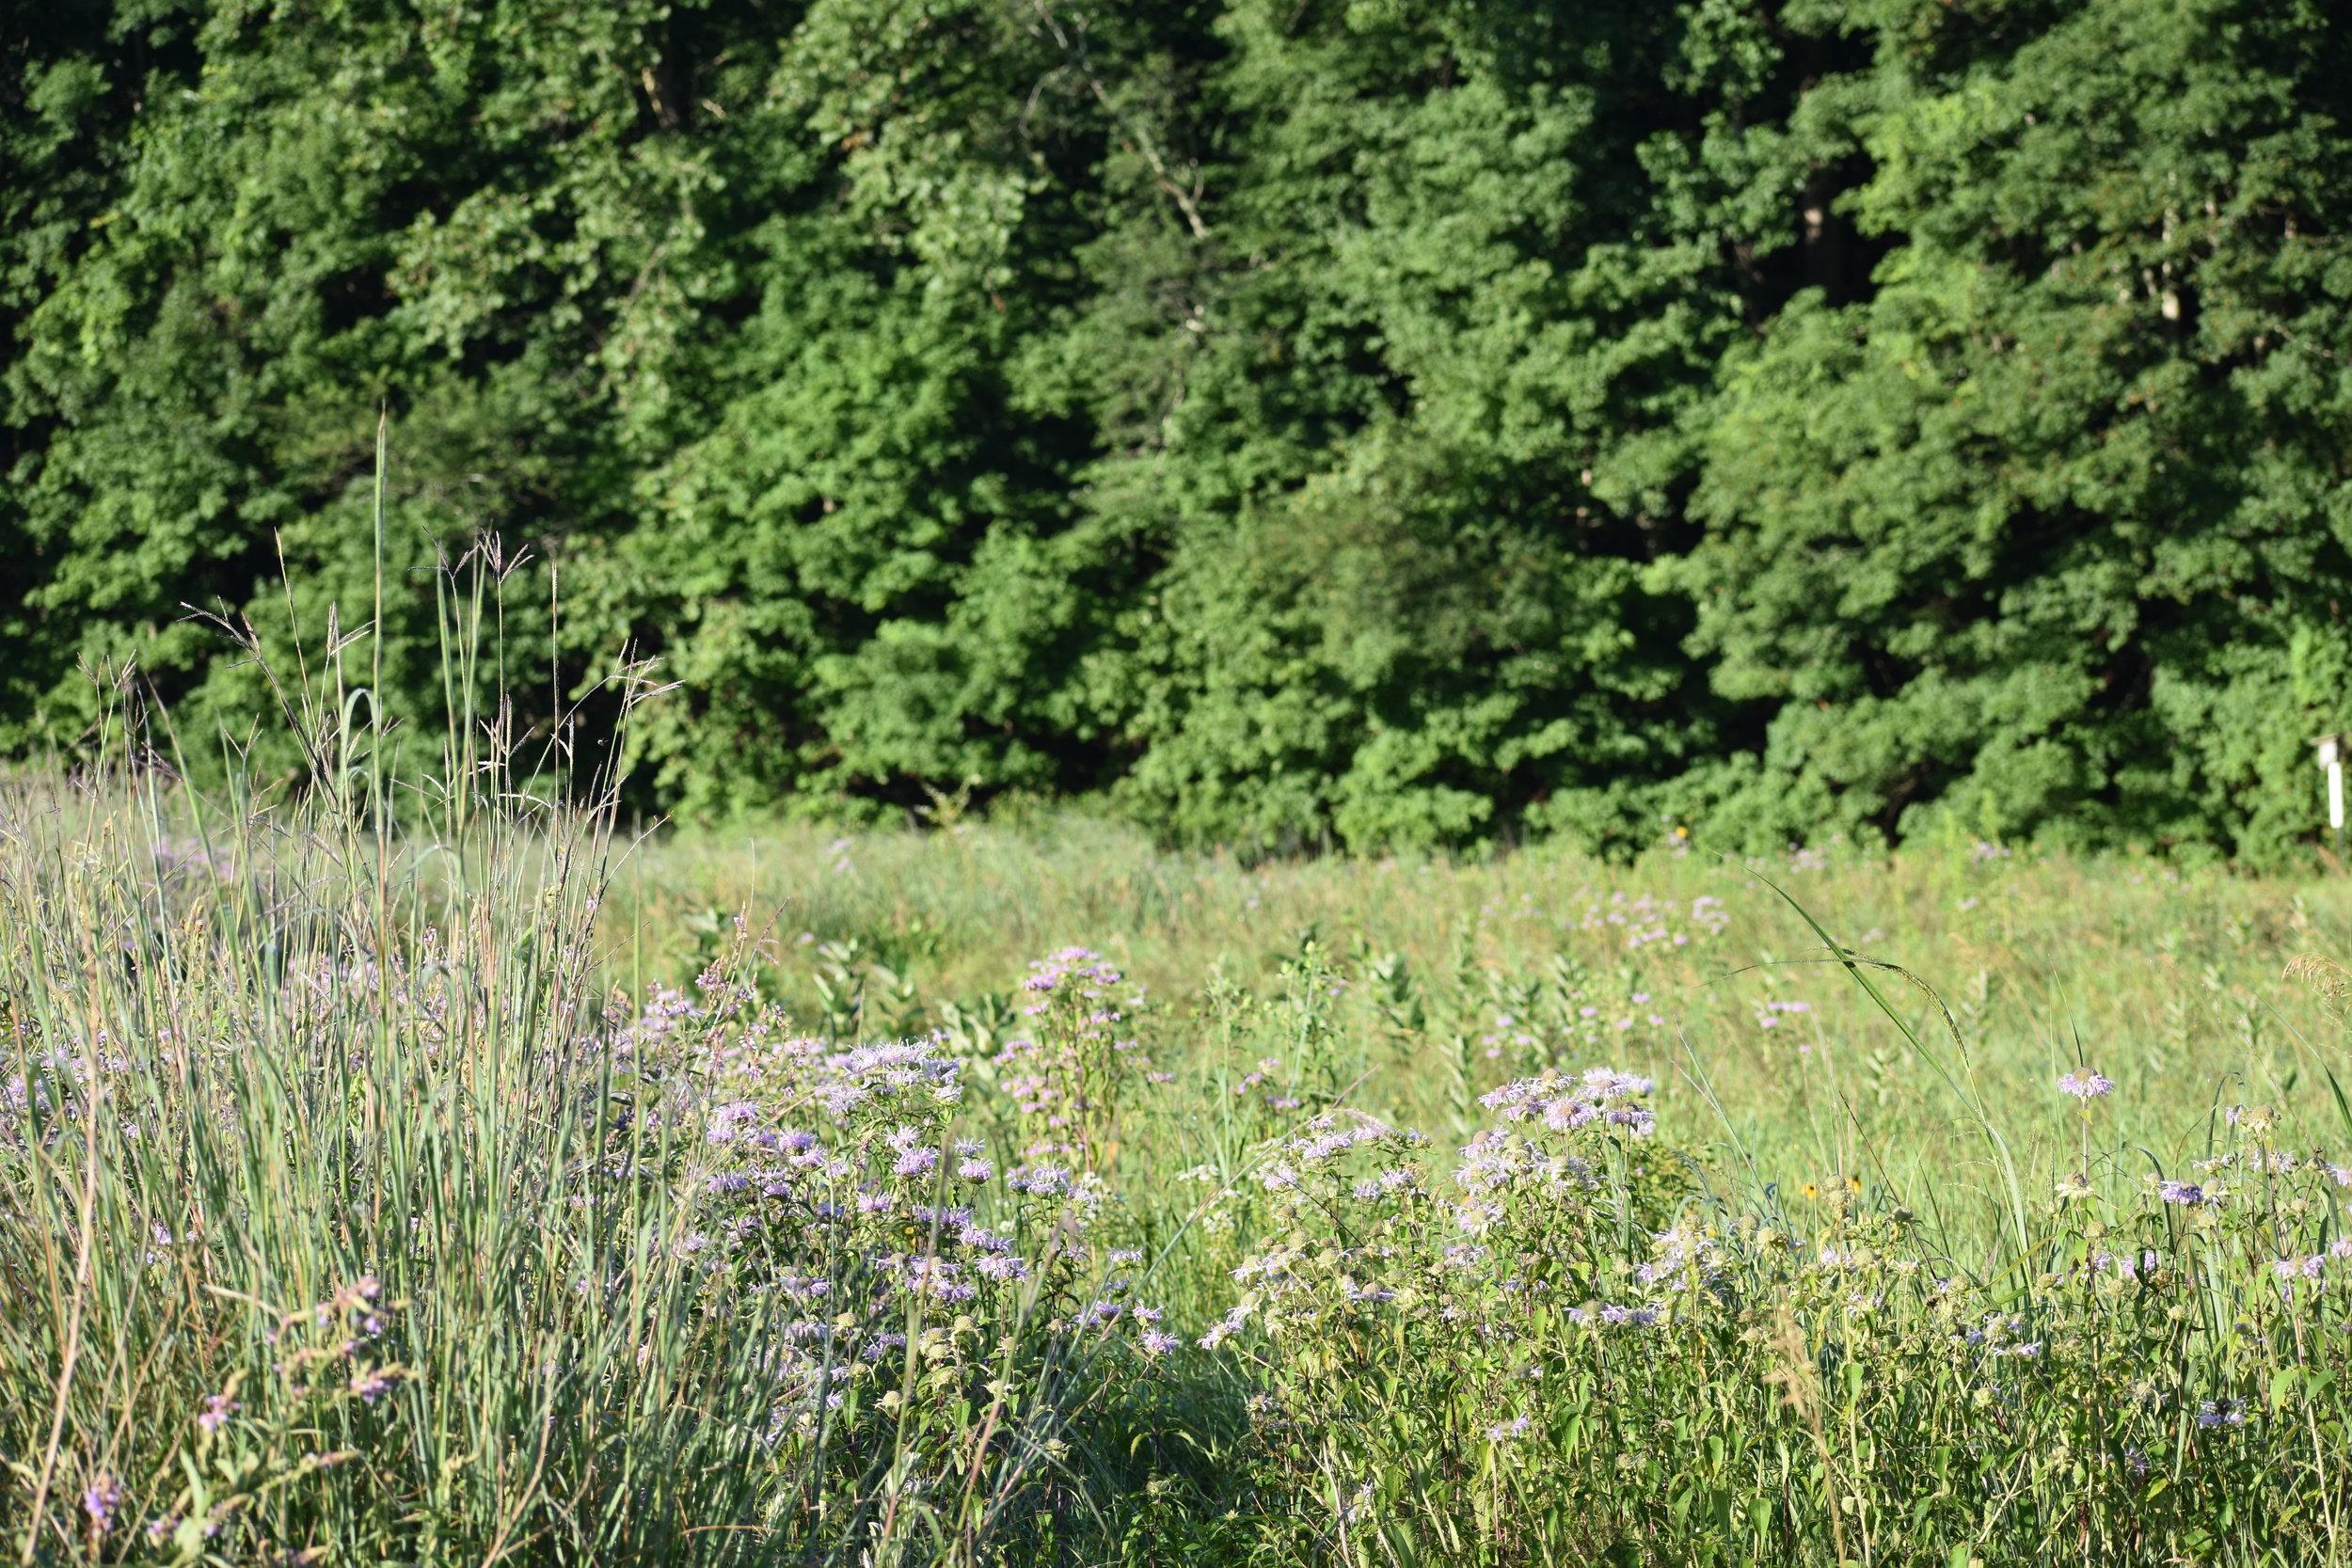 Habitat: Open Woodland/Field